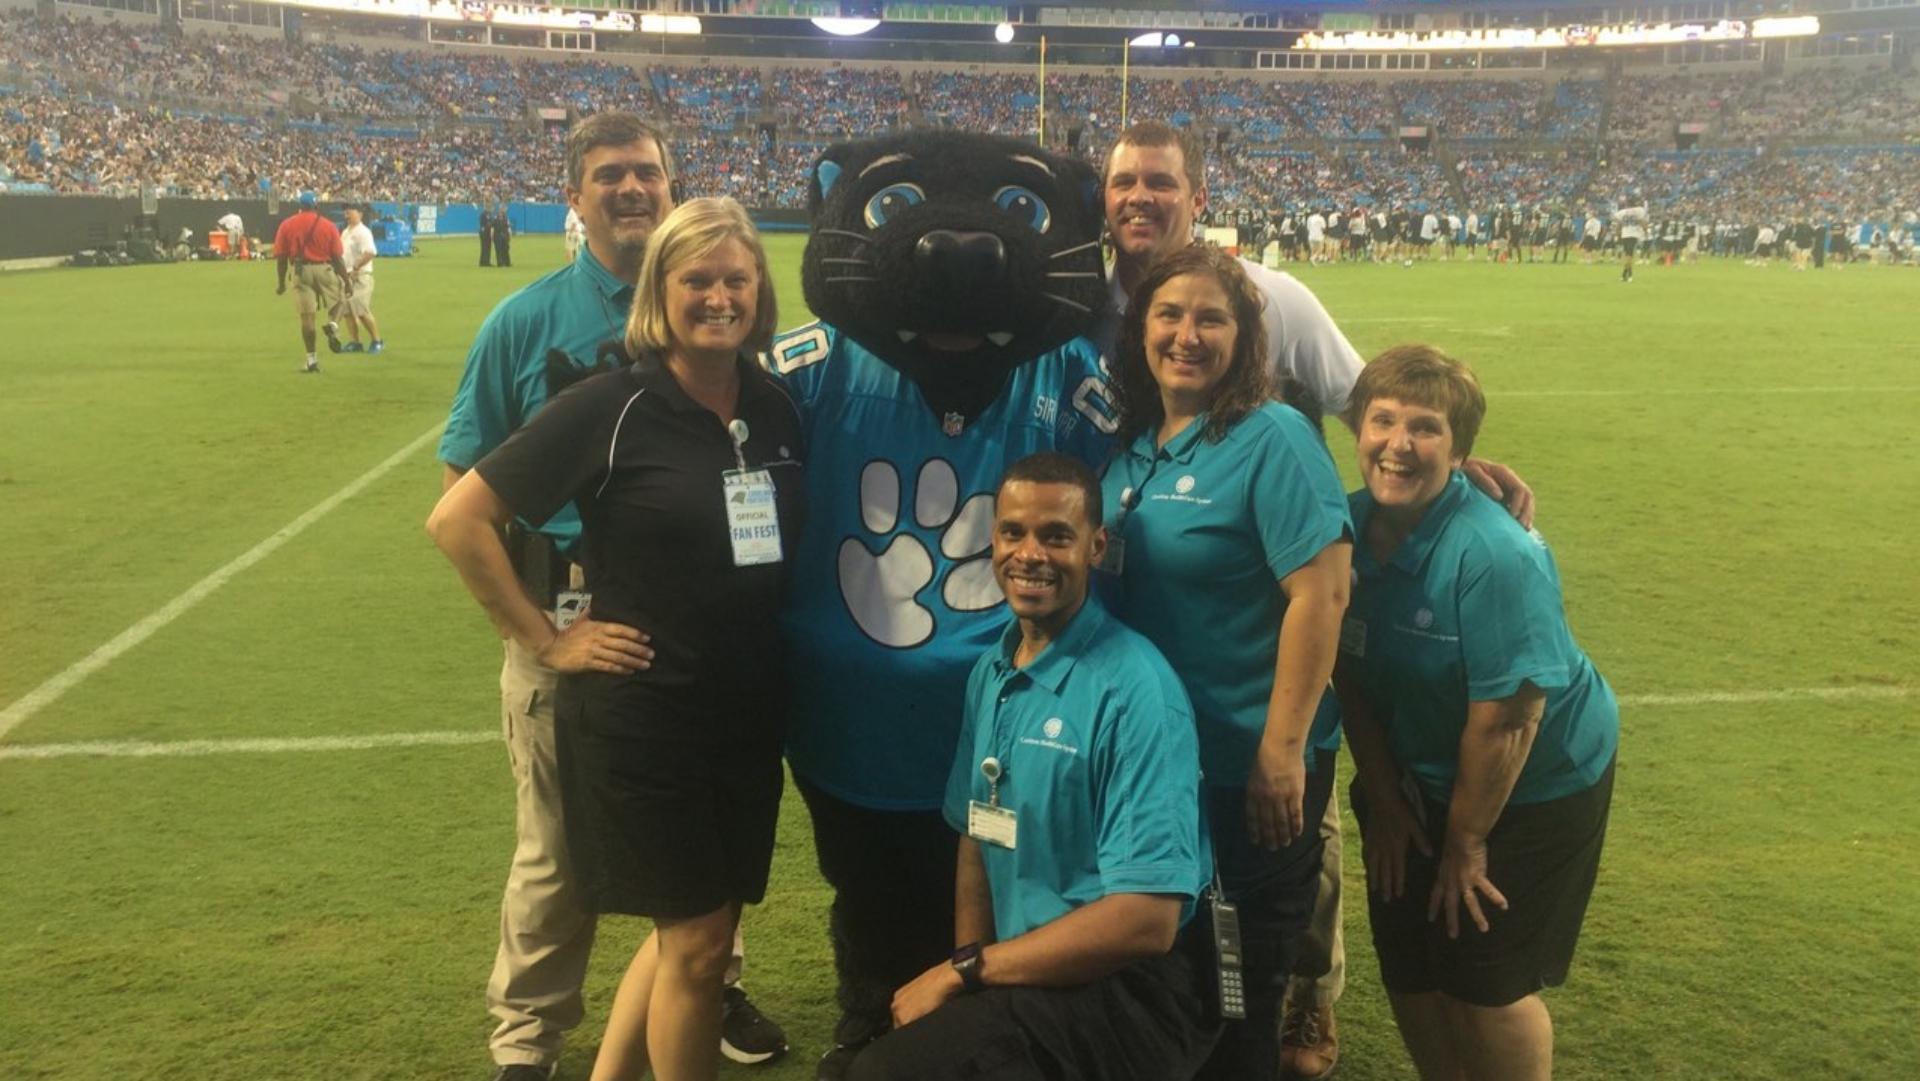 Connie and Atrium Health team at Carolina Panthers football game